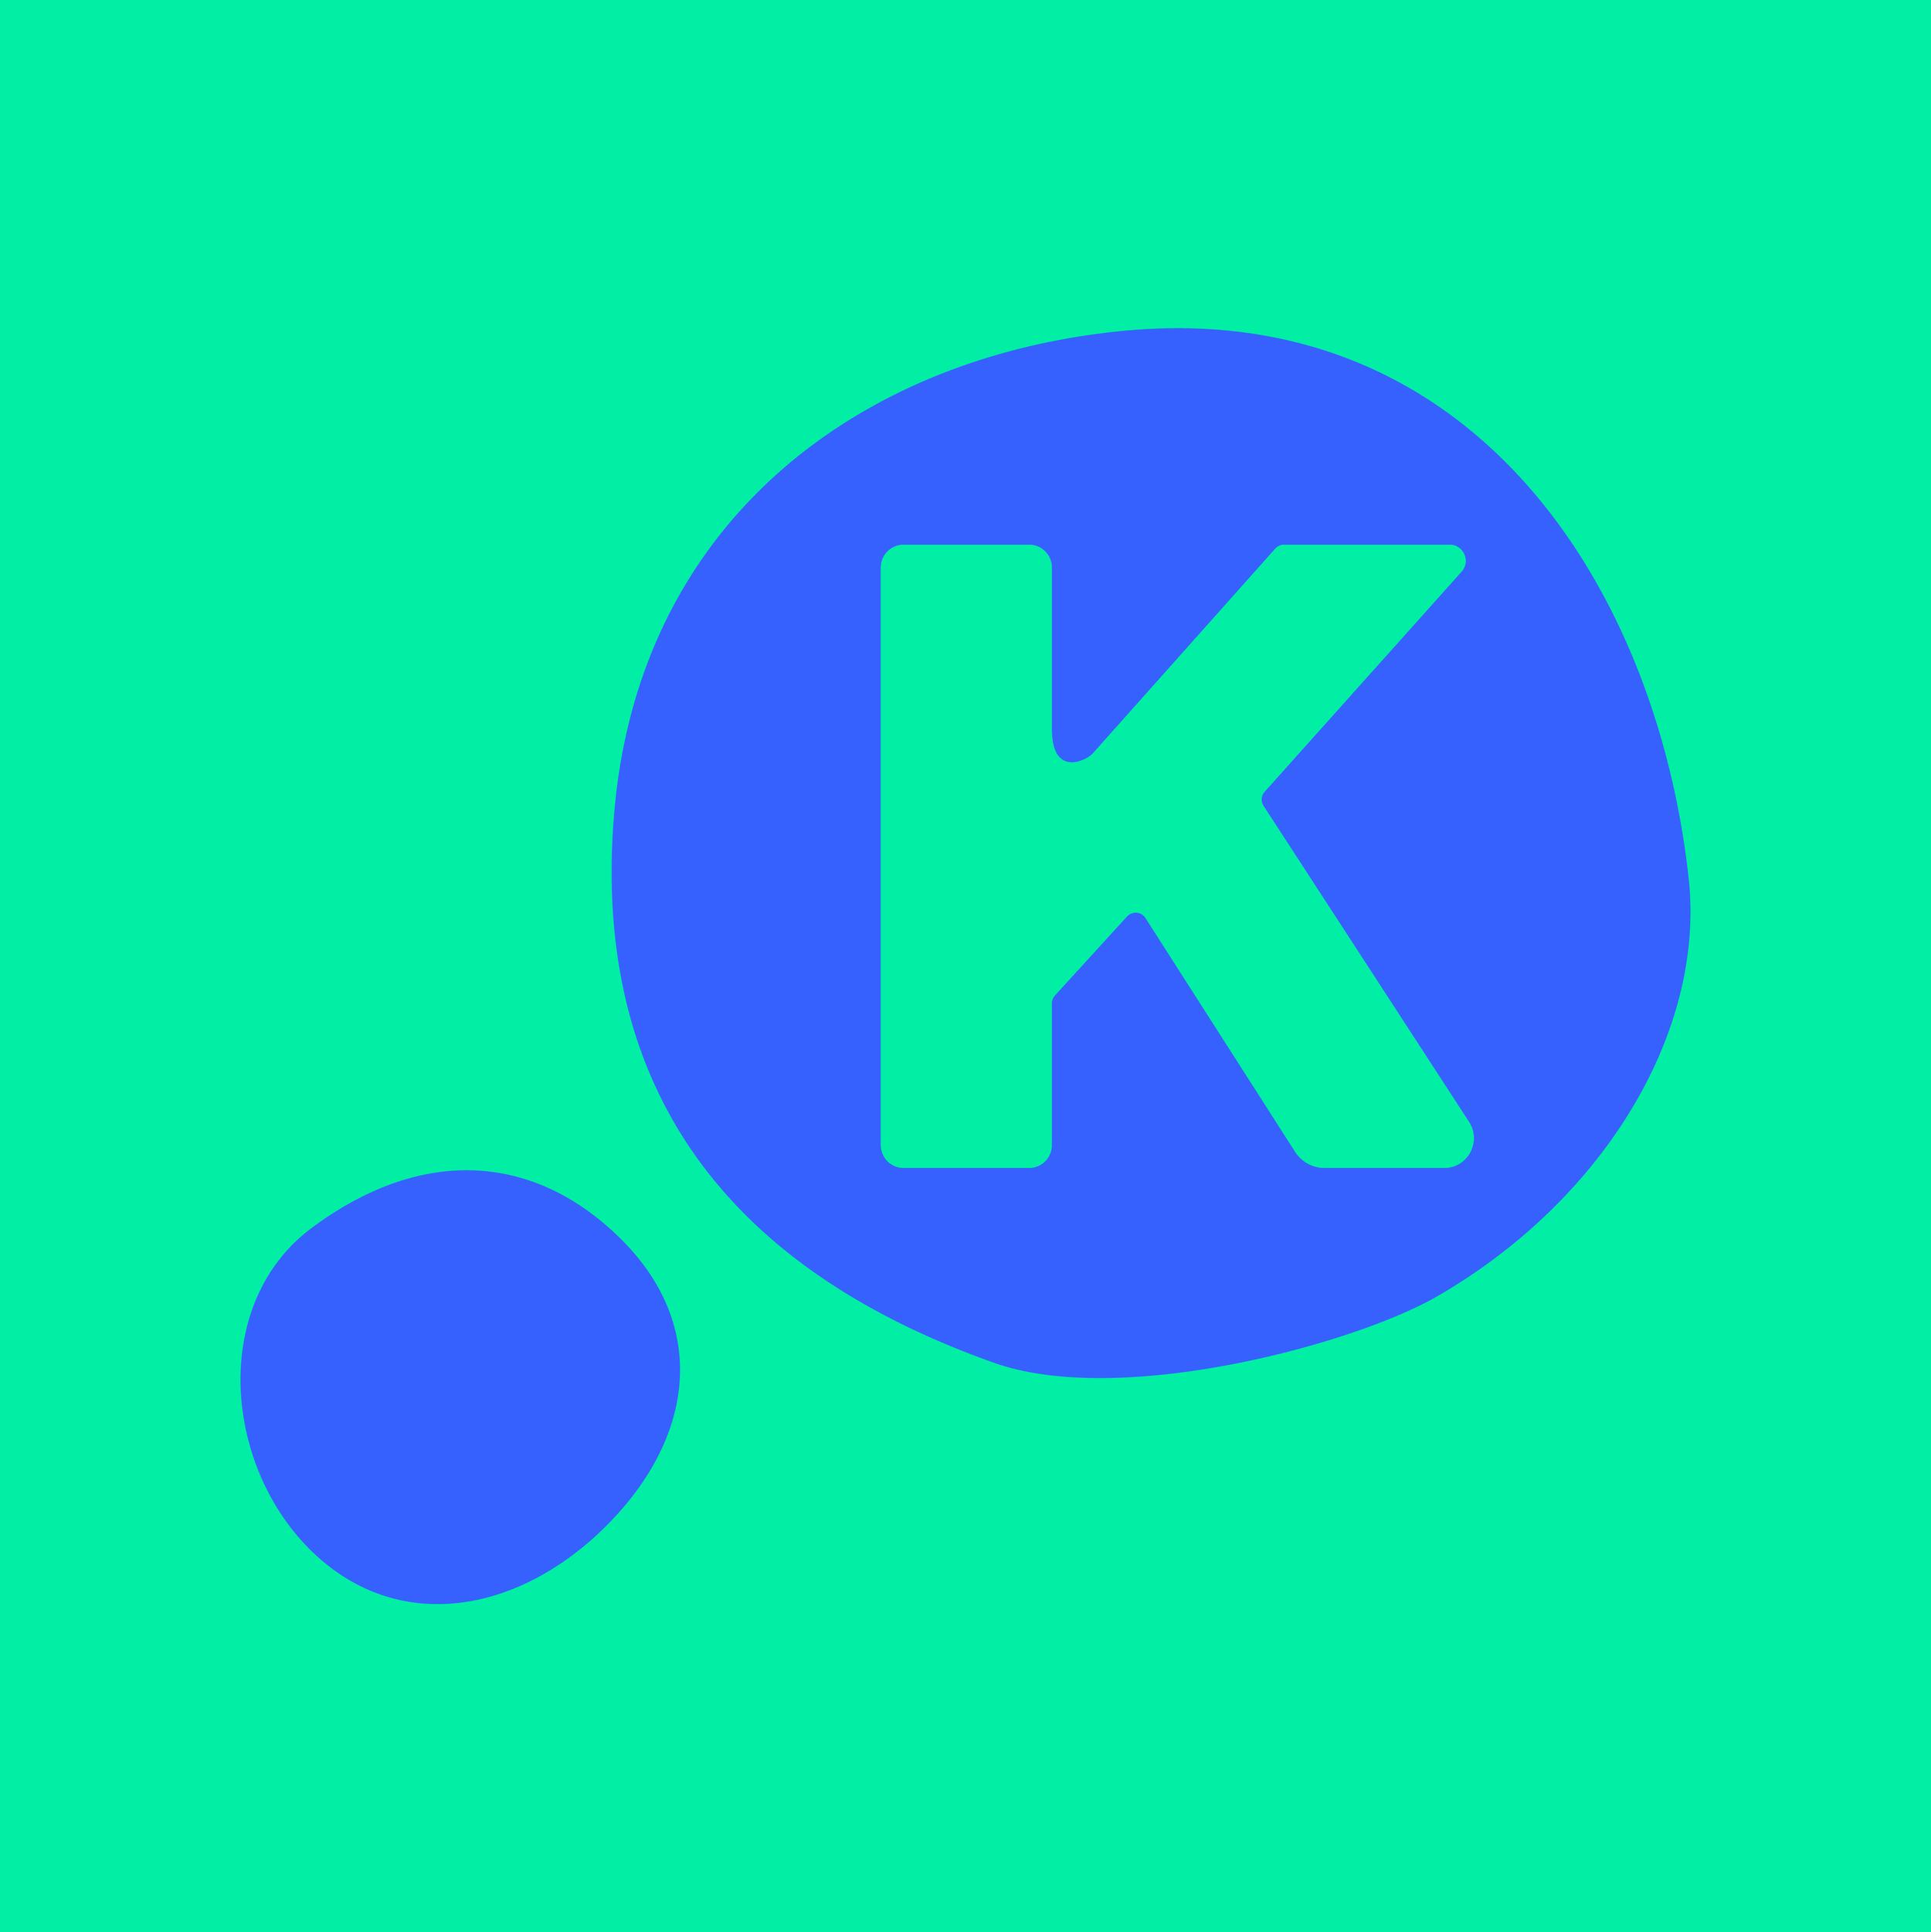 knoma - identity